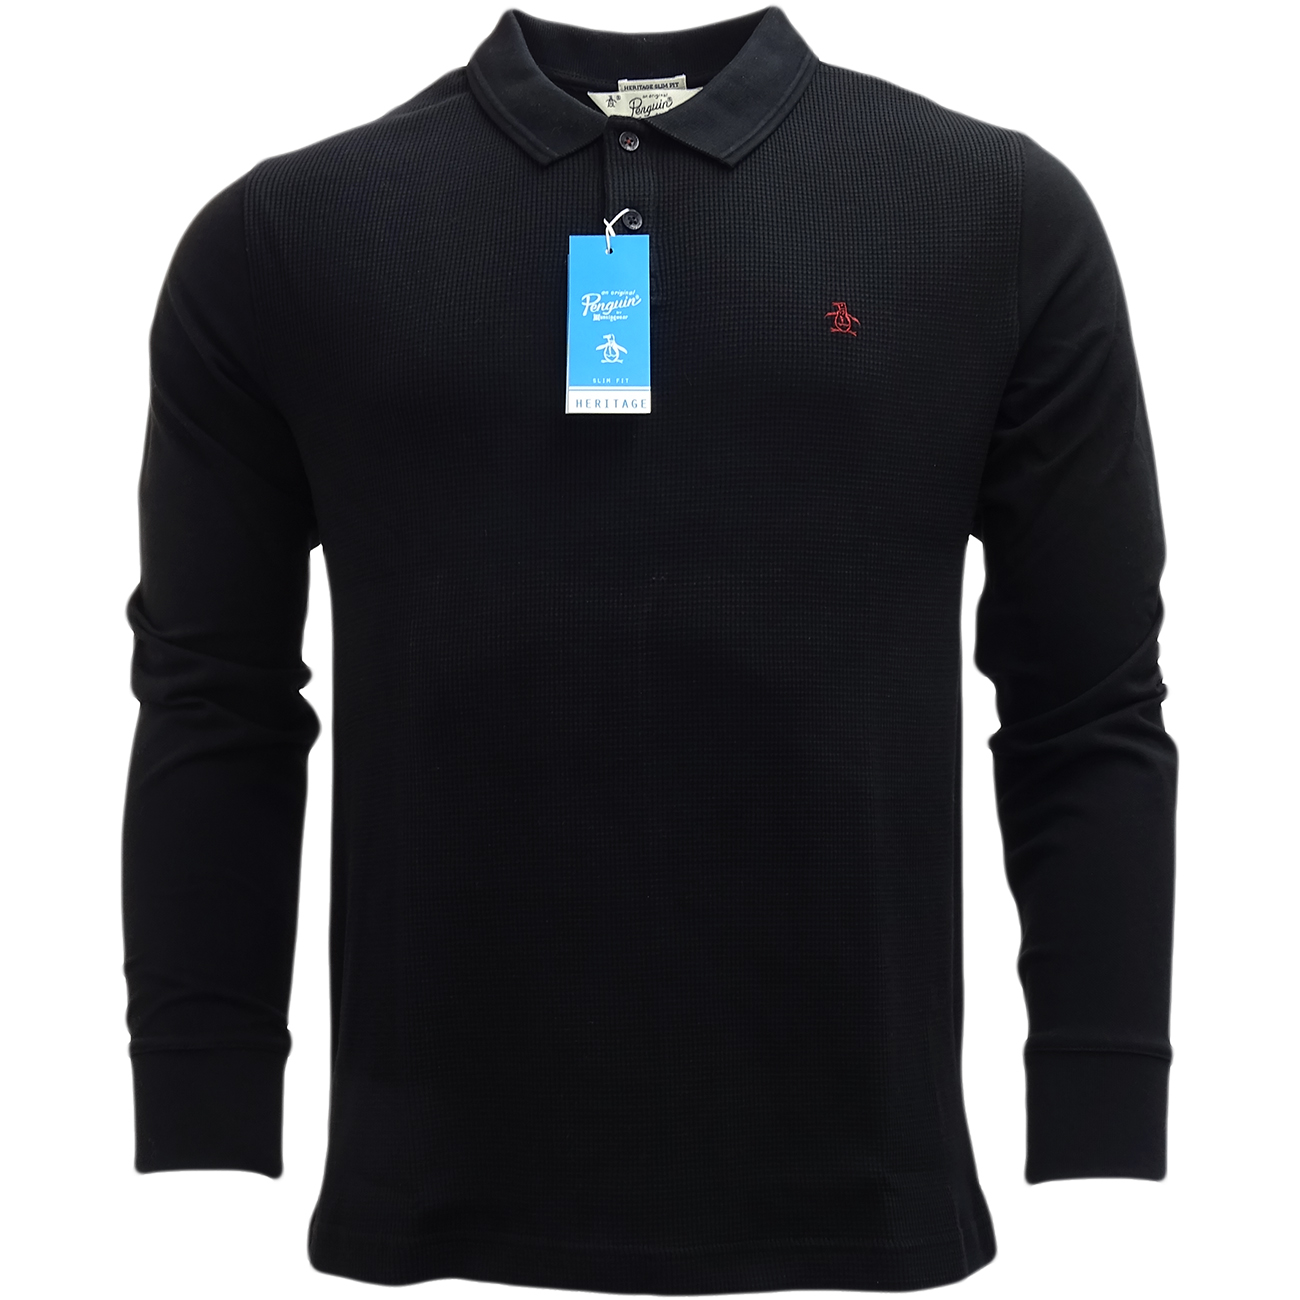 Details about Original Penguin Long Sleeve Polo Shirt 6317